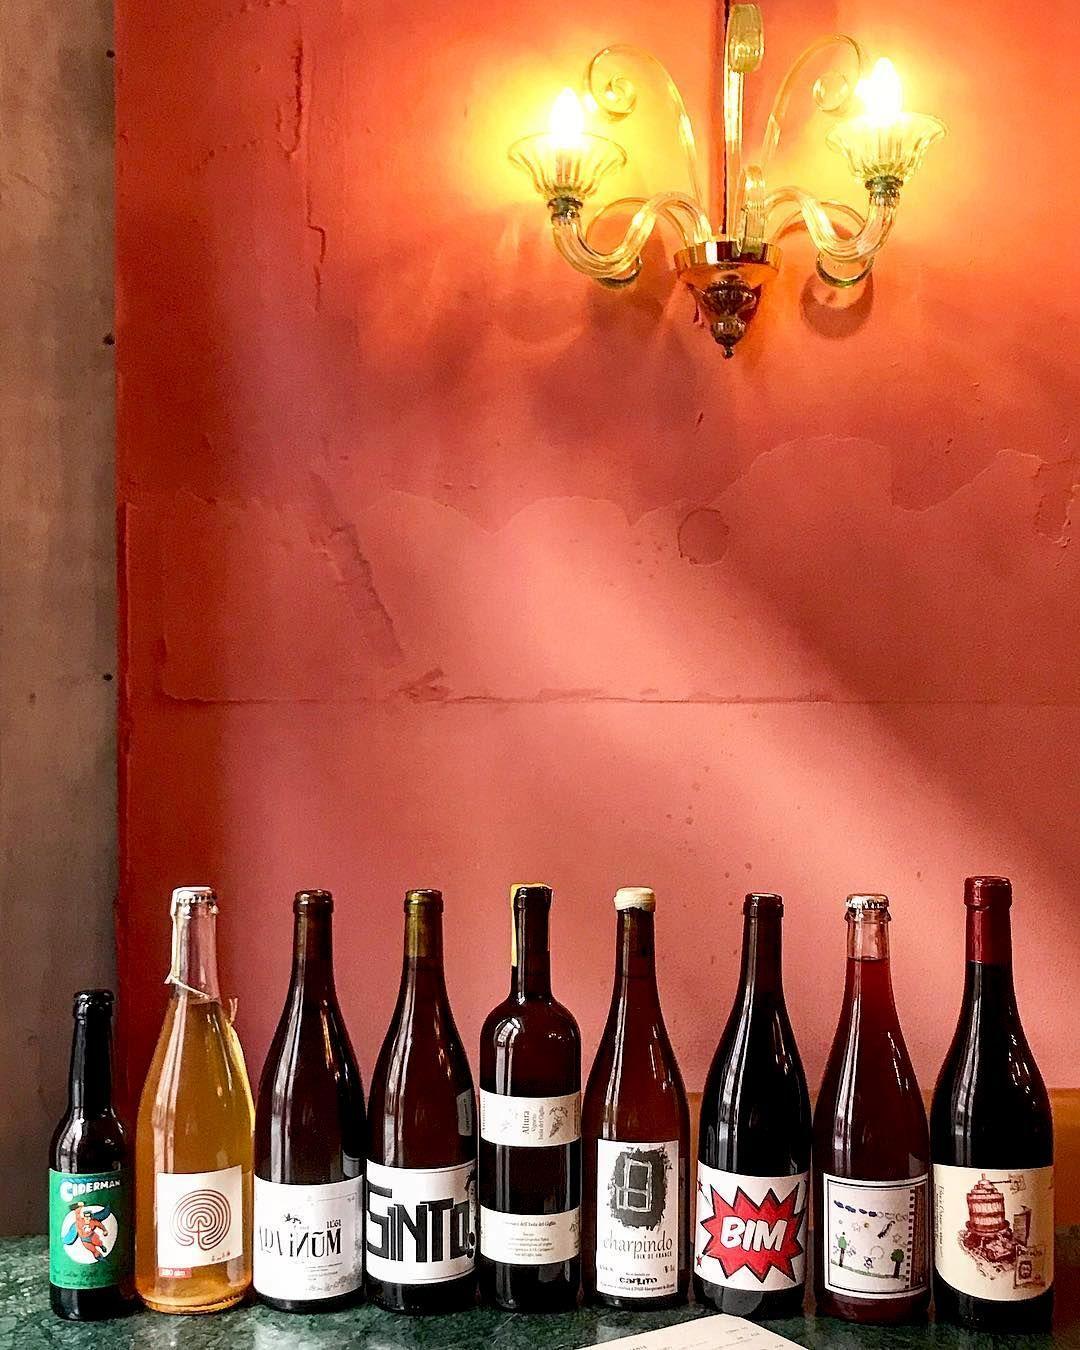 The Best New Restaurants Cafes And Bars In Copenhagen To Try In 2019 Restaurant Scandinavian Food Natural Wine